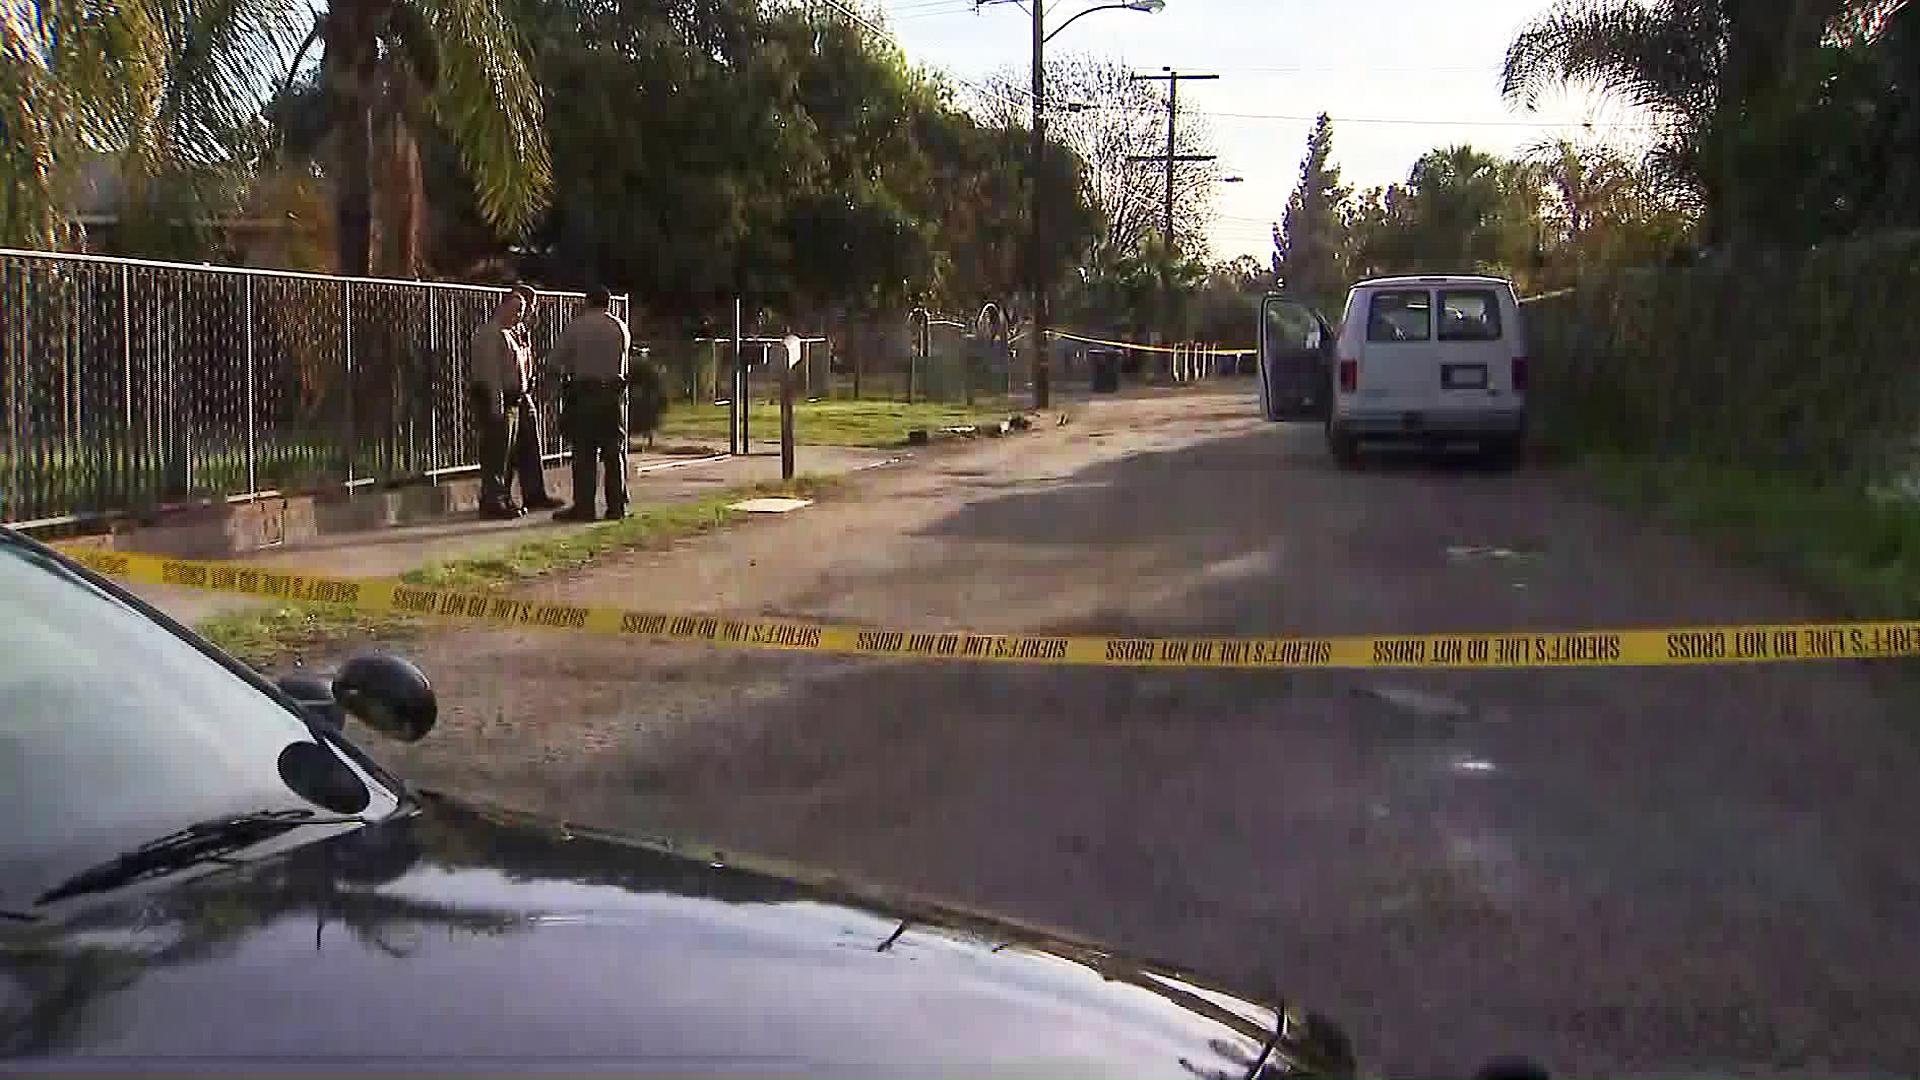 Authorities investigate a fatal stabbing in Pico Rivera on Jan. 8, 2019. (Credit: KTLA)